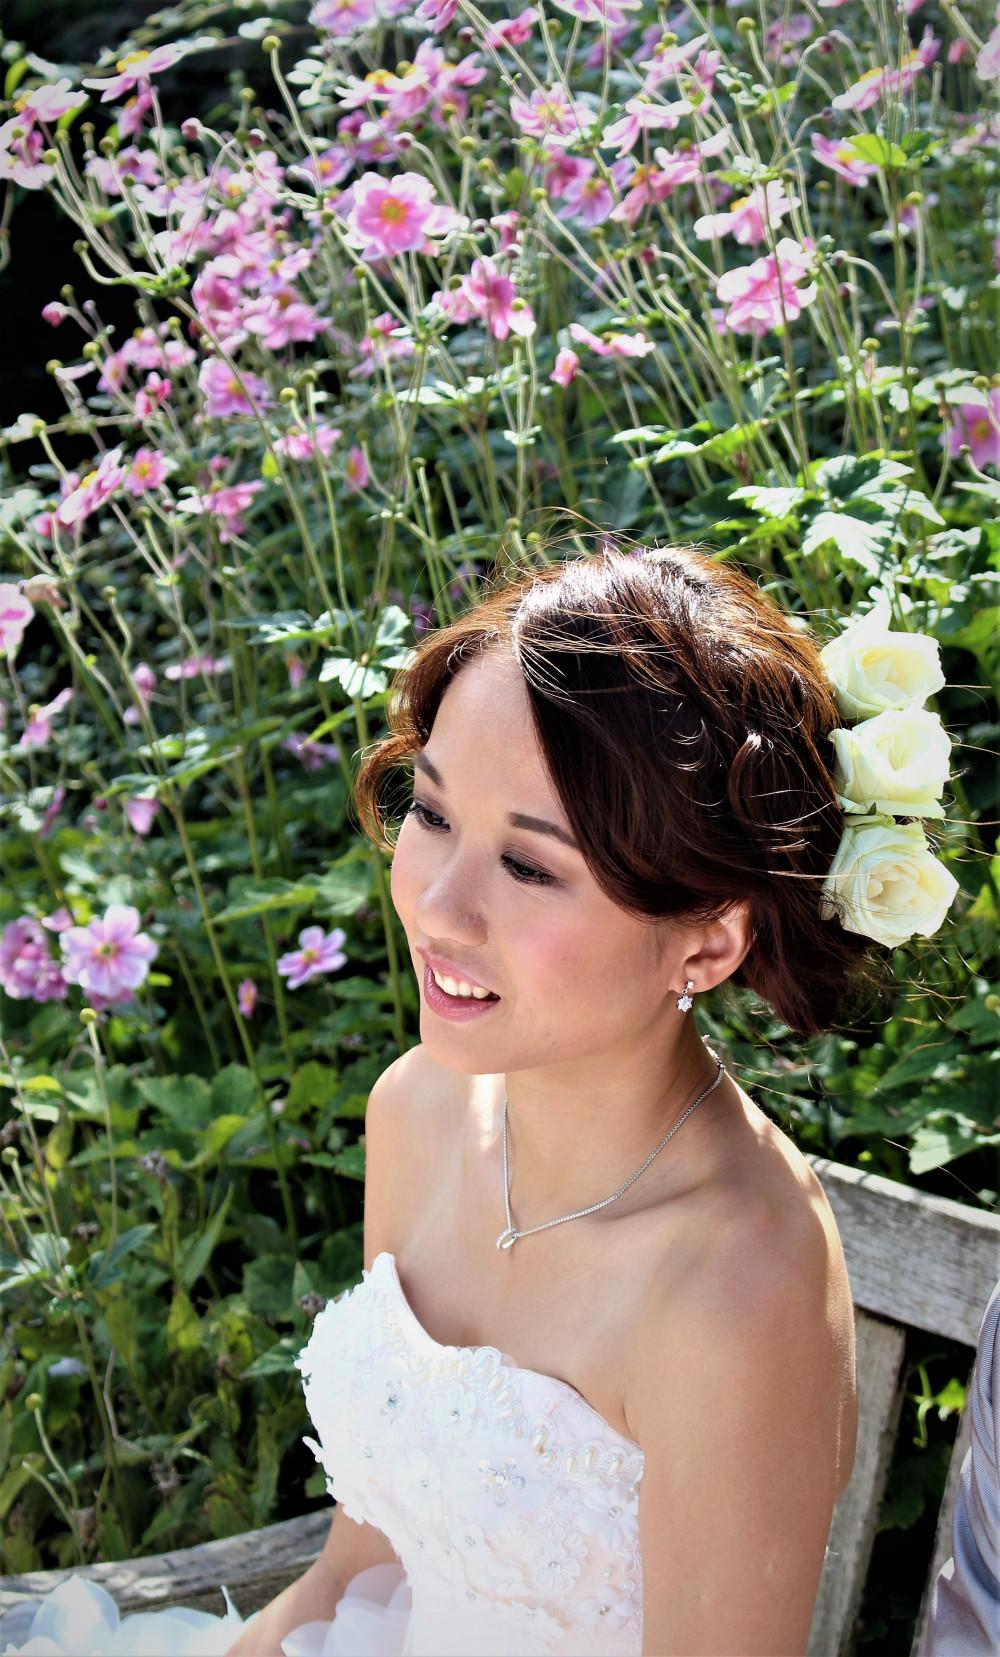 Bride's makeup and hair by me - Make Me Bridal Artist: Jurga Sidagyte Make up artist.